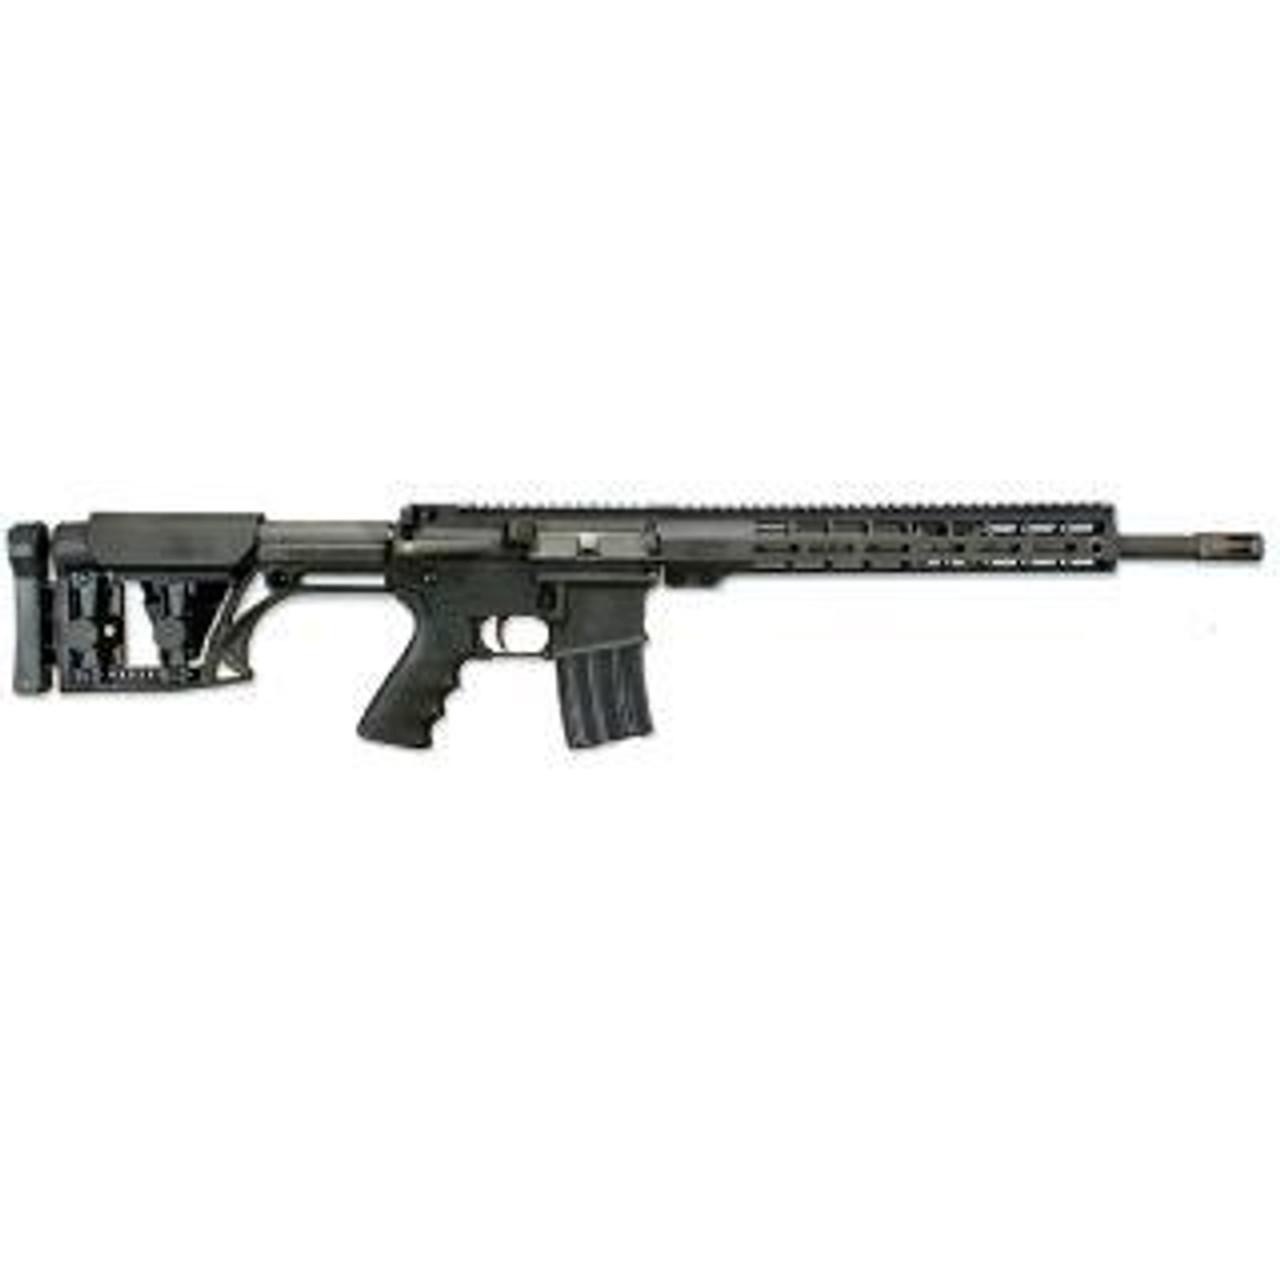 Windham Weaponry R16 Thumper CALIFORNIA LEGAL -  .450Bushmaster